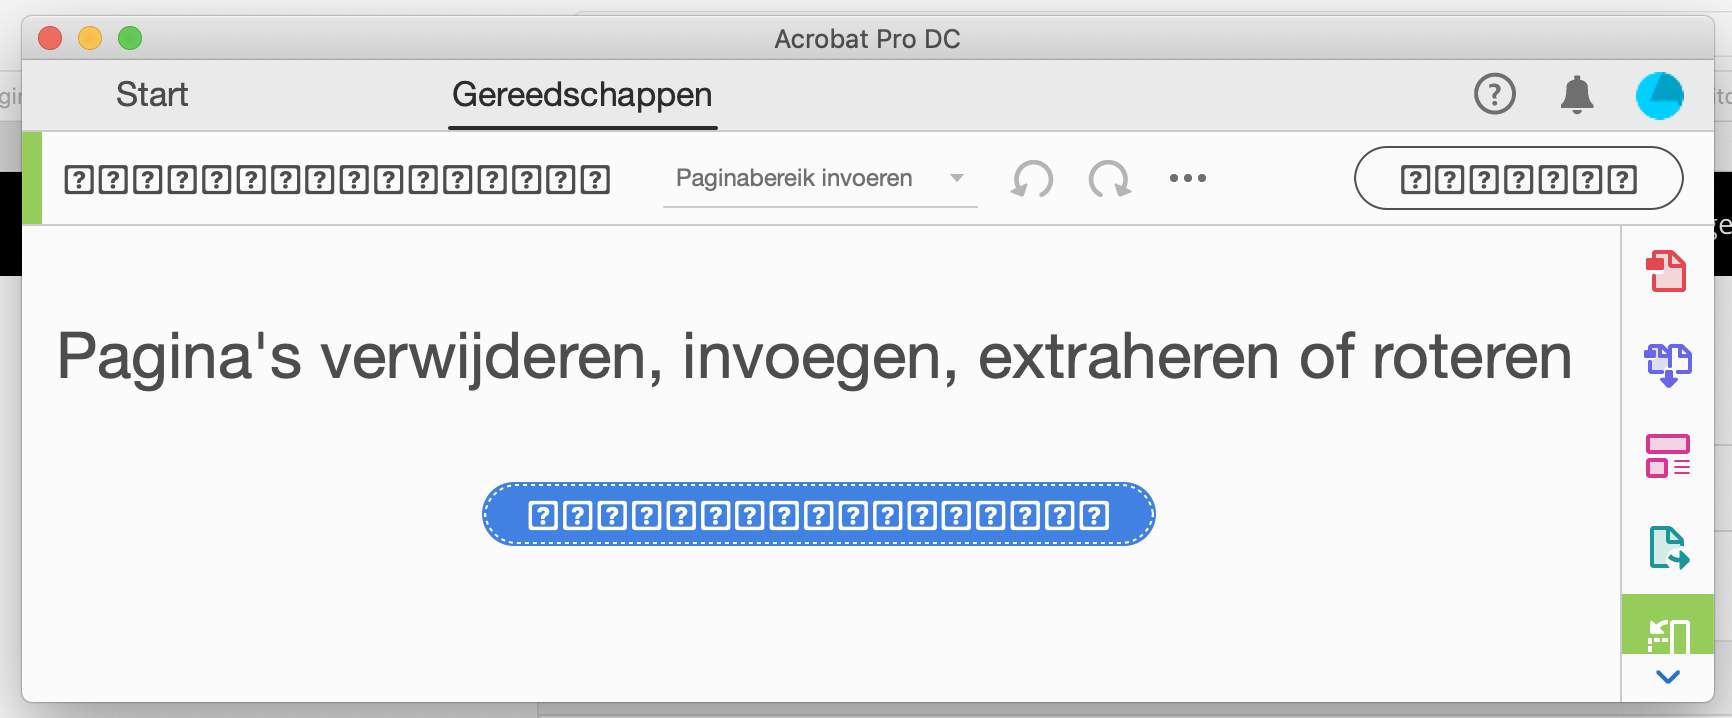 Screenshot Acrobat Pro